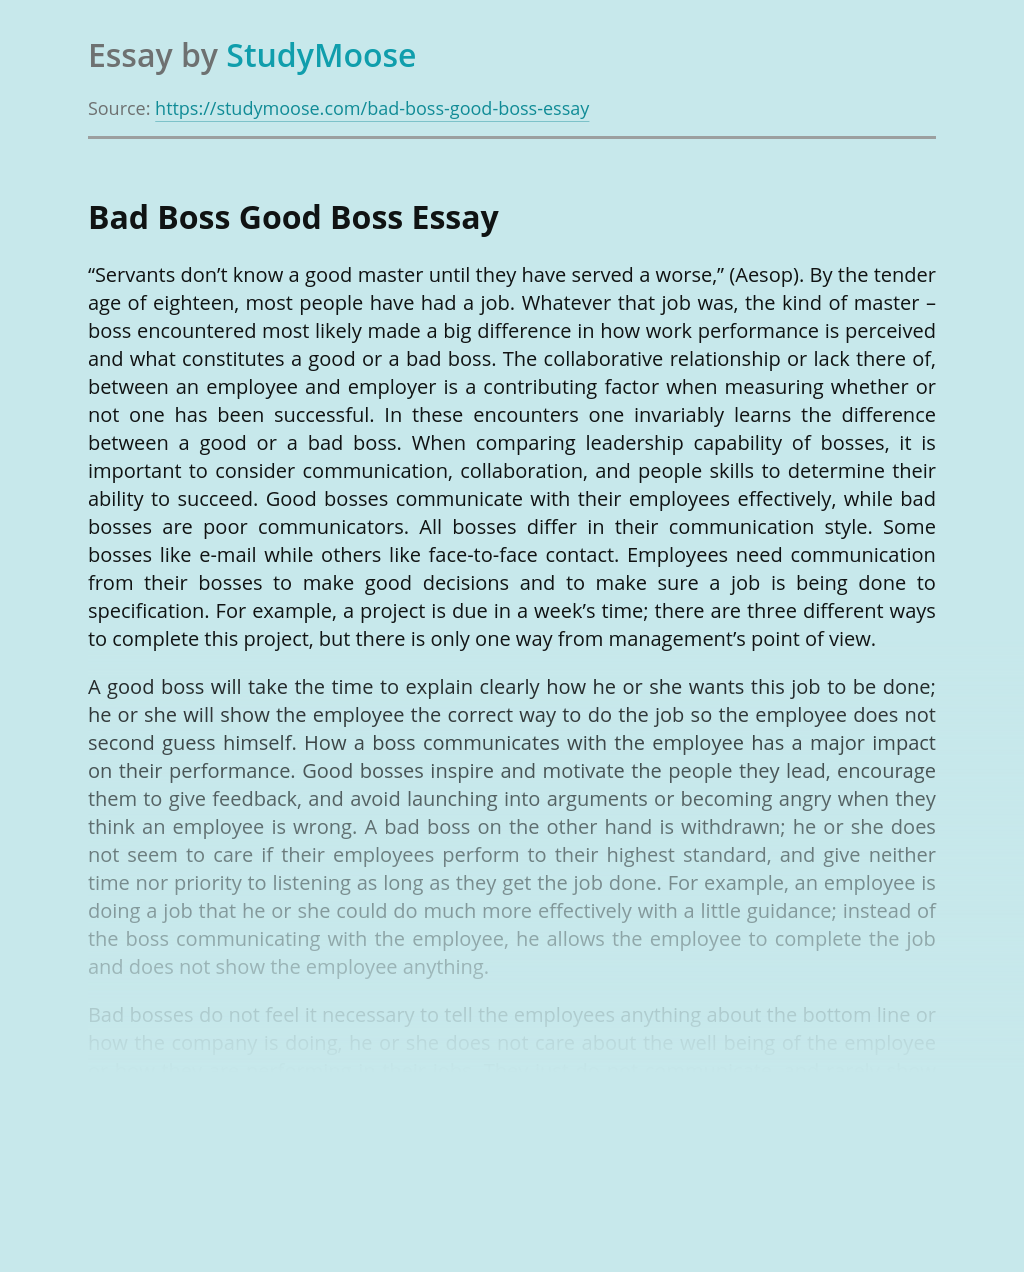 Bad Boss Good Boss